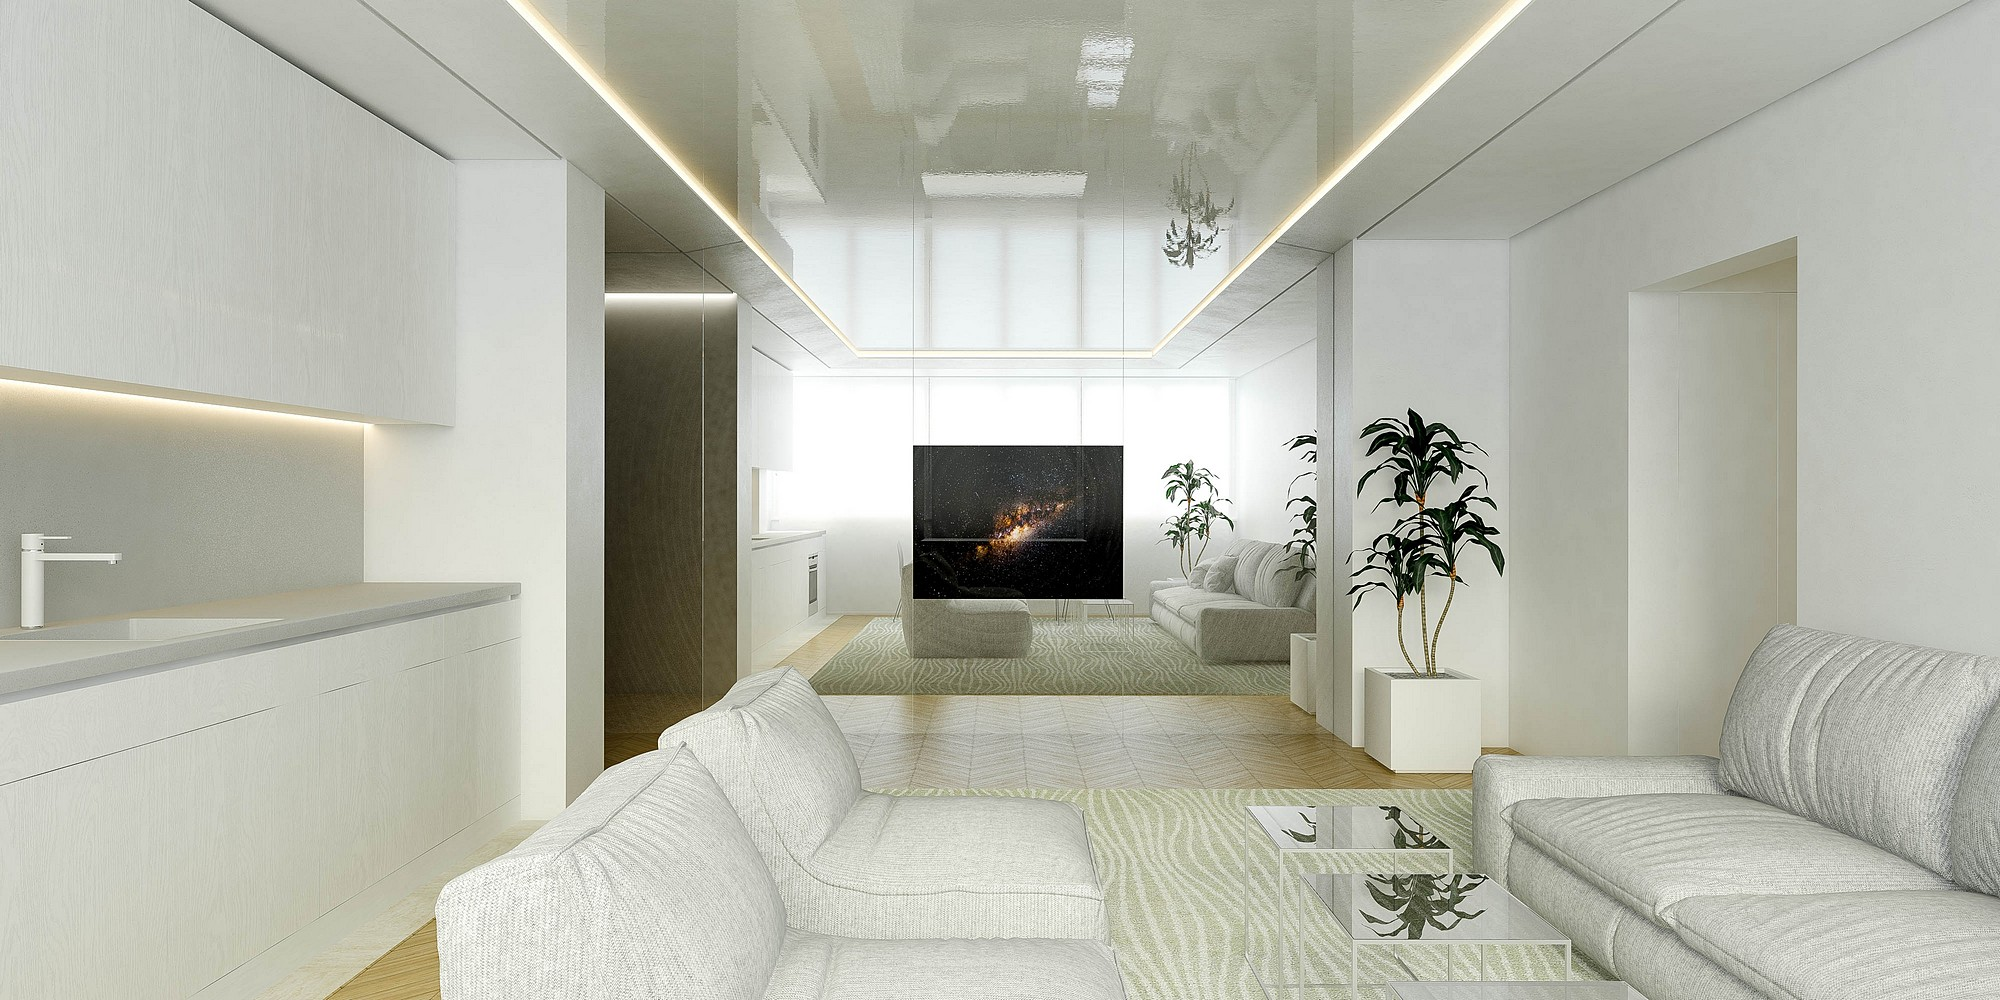 Enterijer-stan-Andreu-Beograd-Studio-Alfirevic-arhitektura-arhitekta-01